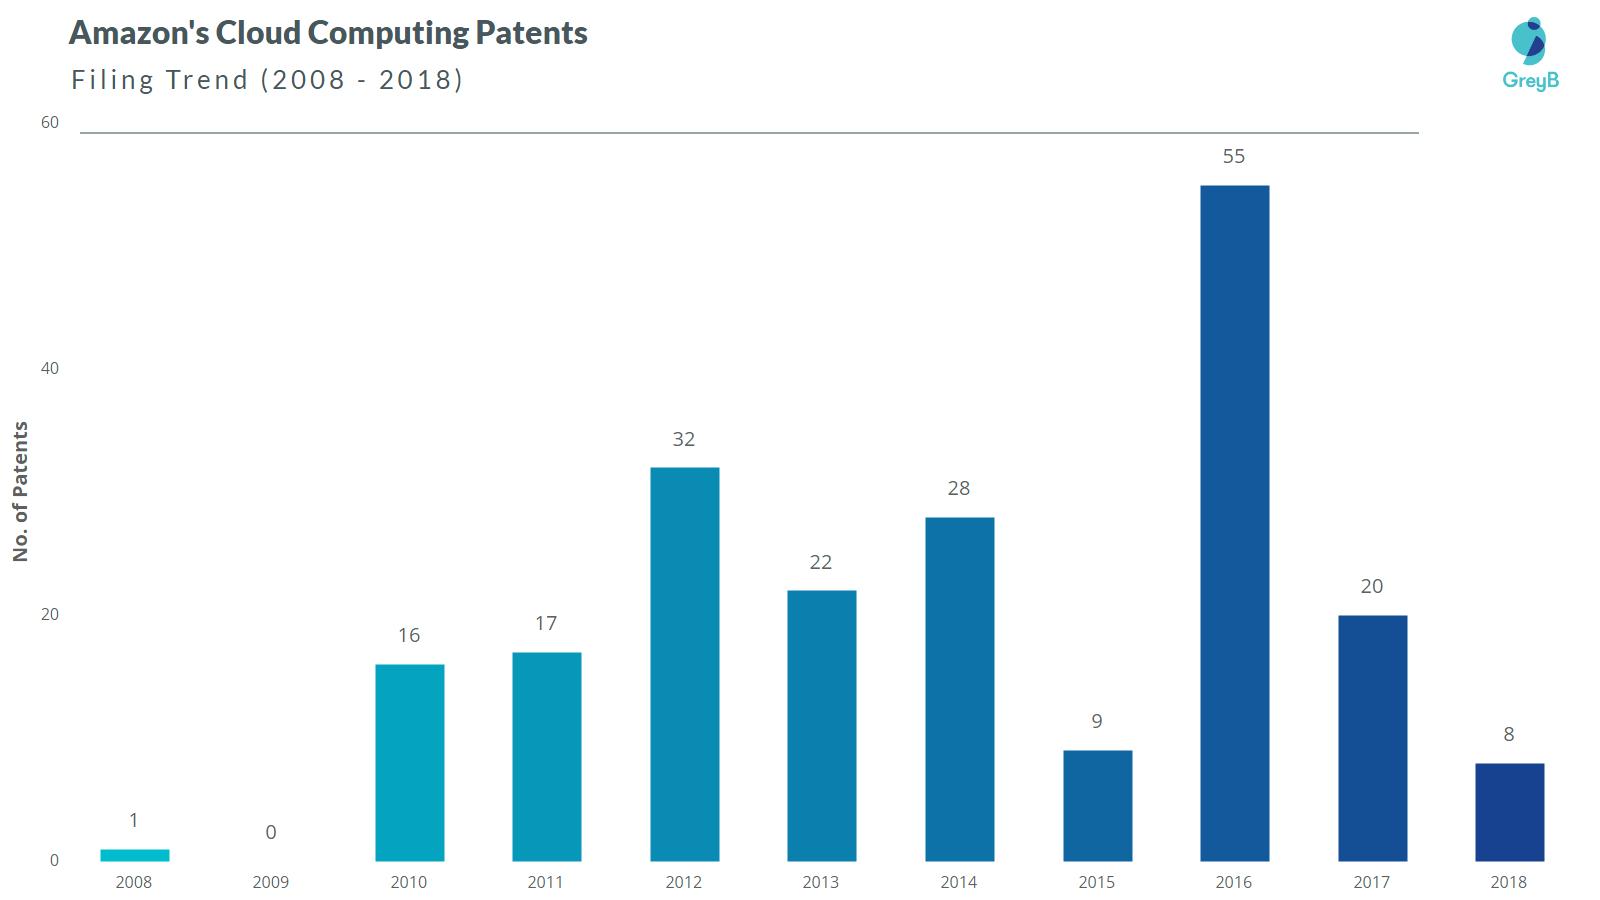 Amazon Cloud Computing Patents